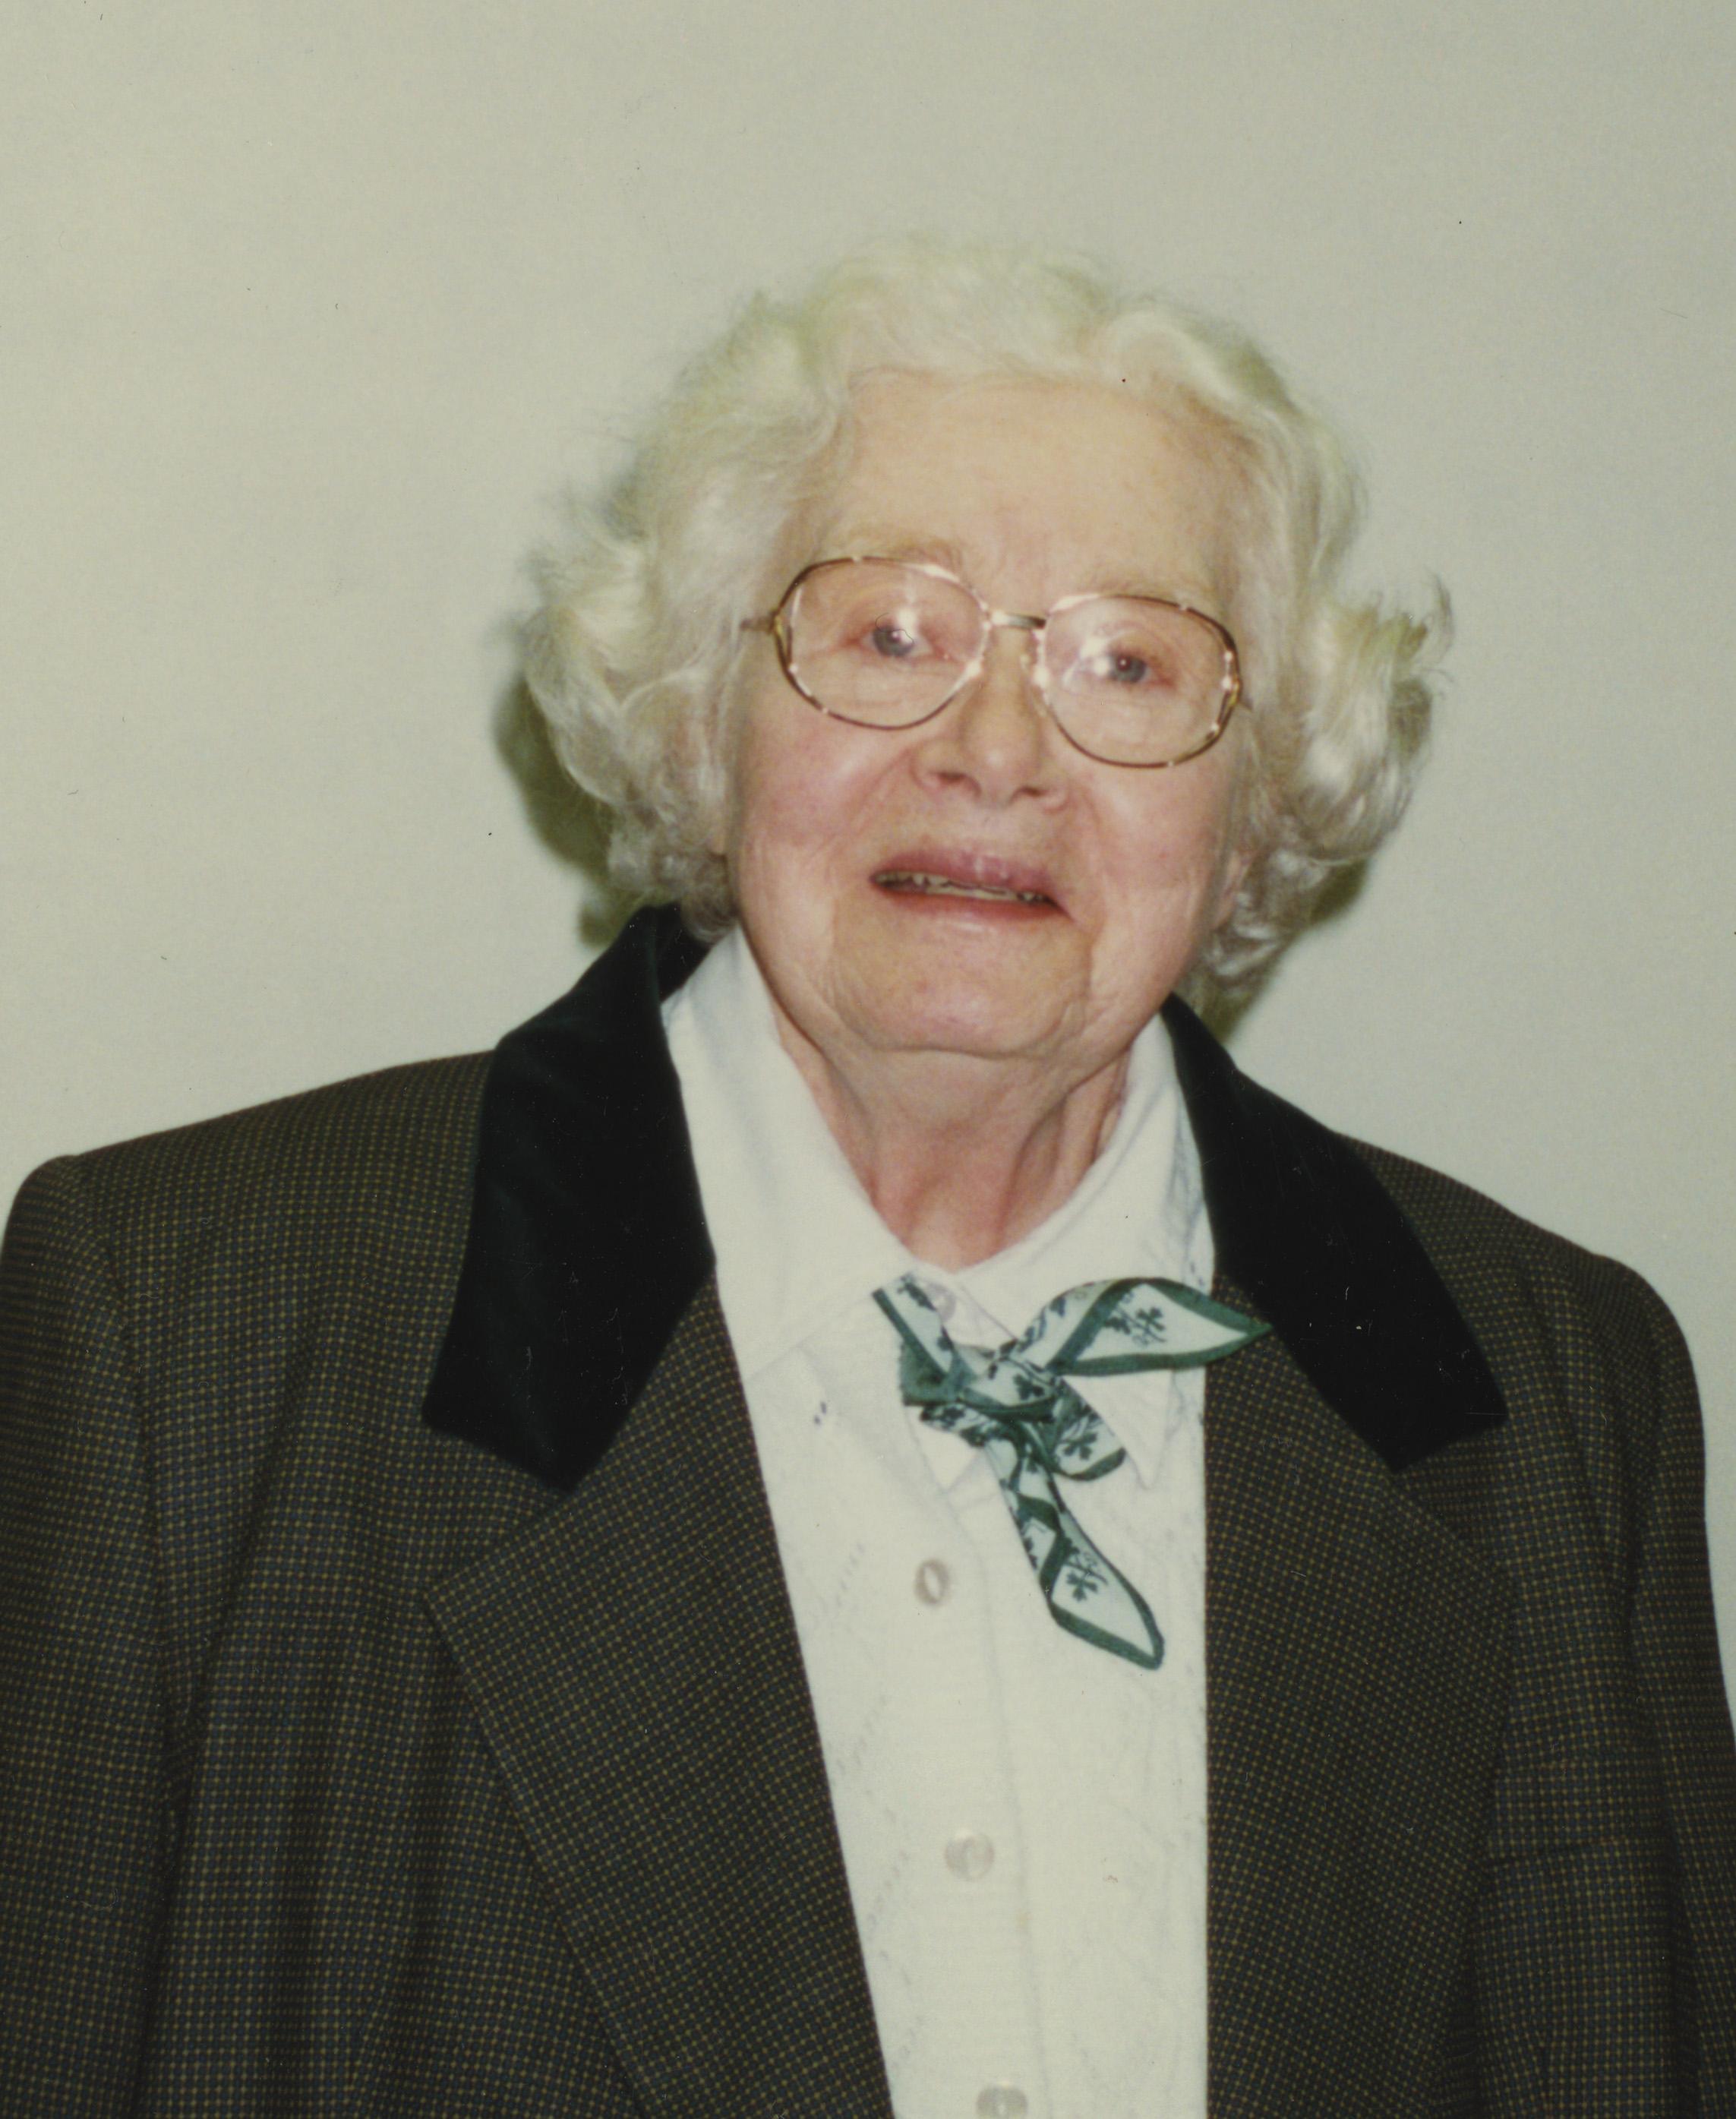 Photograph of Betty Sams Christian, courtesy of Virginia Historical Society, Richmond.